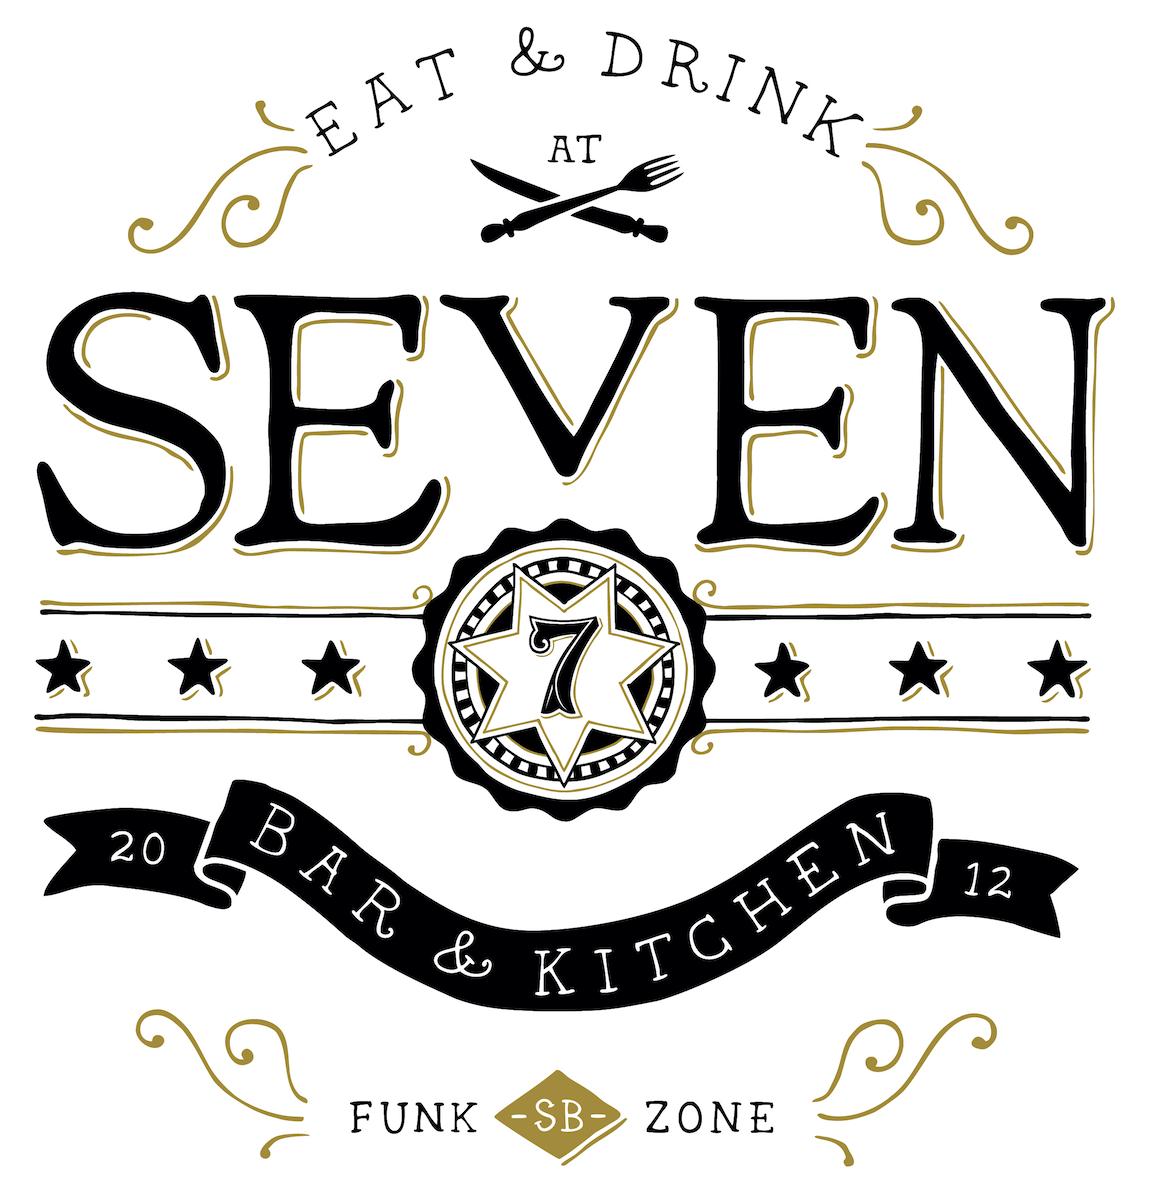 santa barbara California Funk Zone restaurant SLTWTR bar wine HAND LETTERING typography design coaster business card menu glasswear Wood Burning